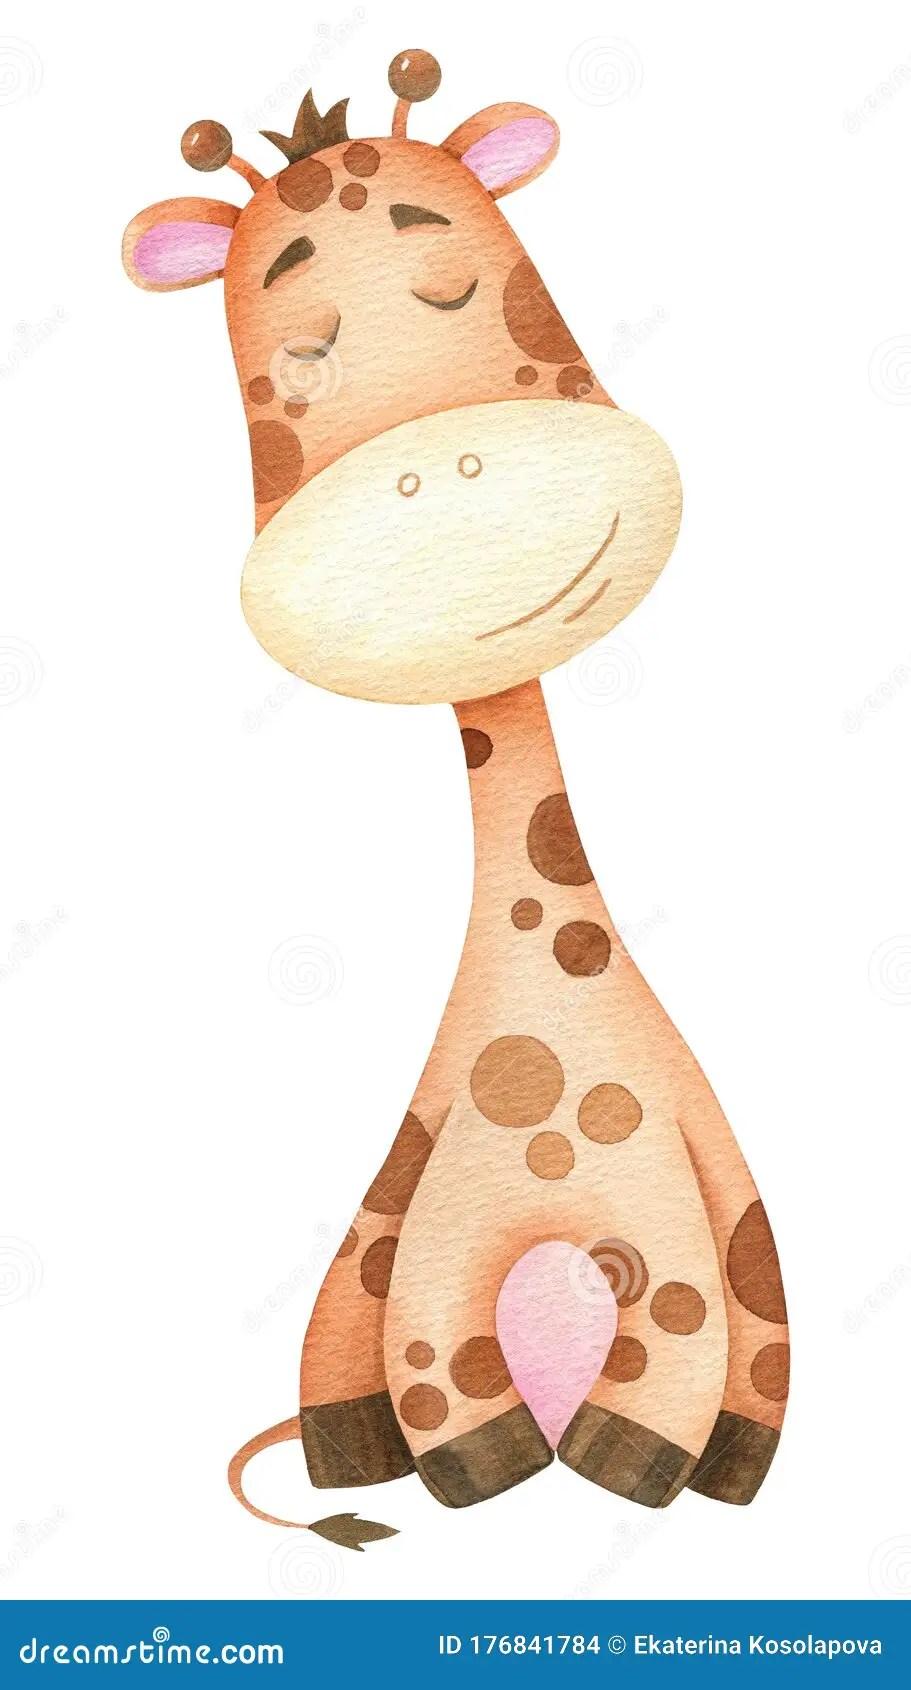 Cute Baby Giraffe Drawing : giraffe, drawing, Watercolor, Drawing, Illustration, Cartoon, Giraffe, Stock, Wild,, Young:, 176841784